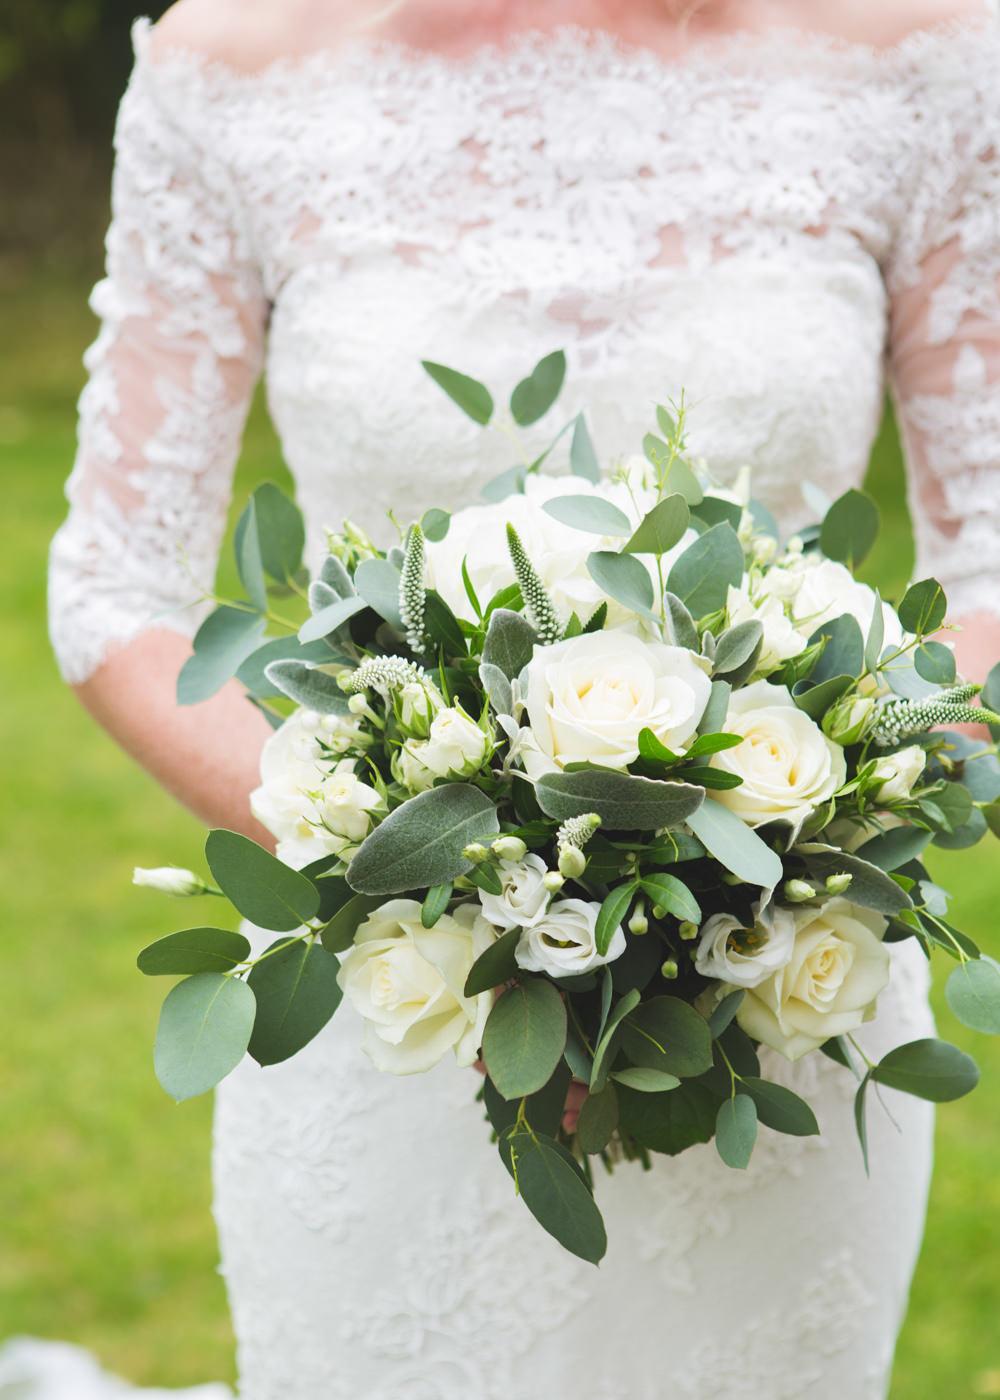 Bouquet Flowers Bride Bridal Greenery Foliage Ivory Rose Airbnb Wedding Pickavance Weddings